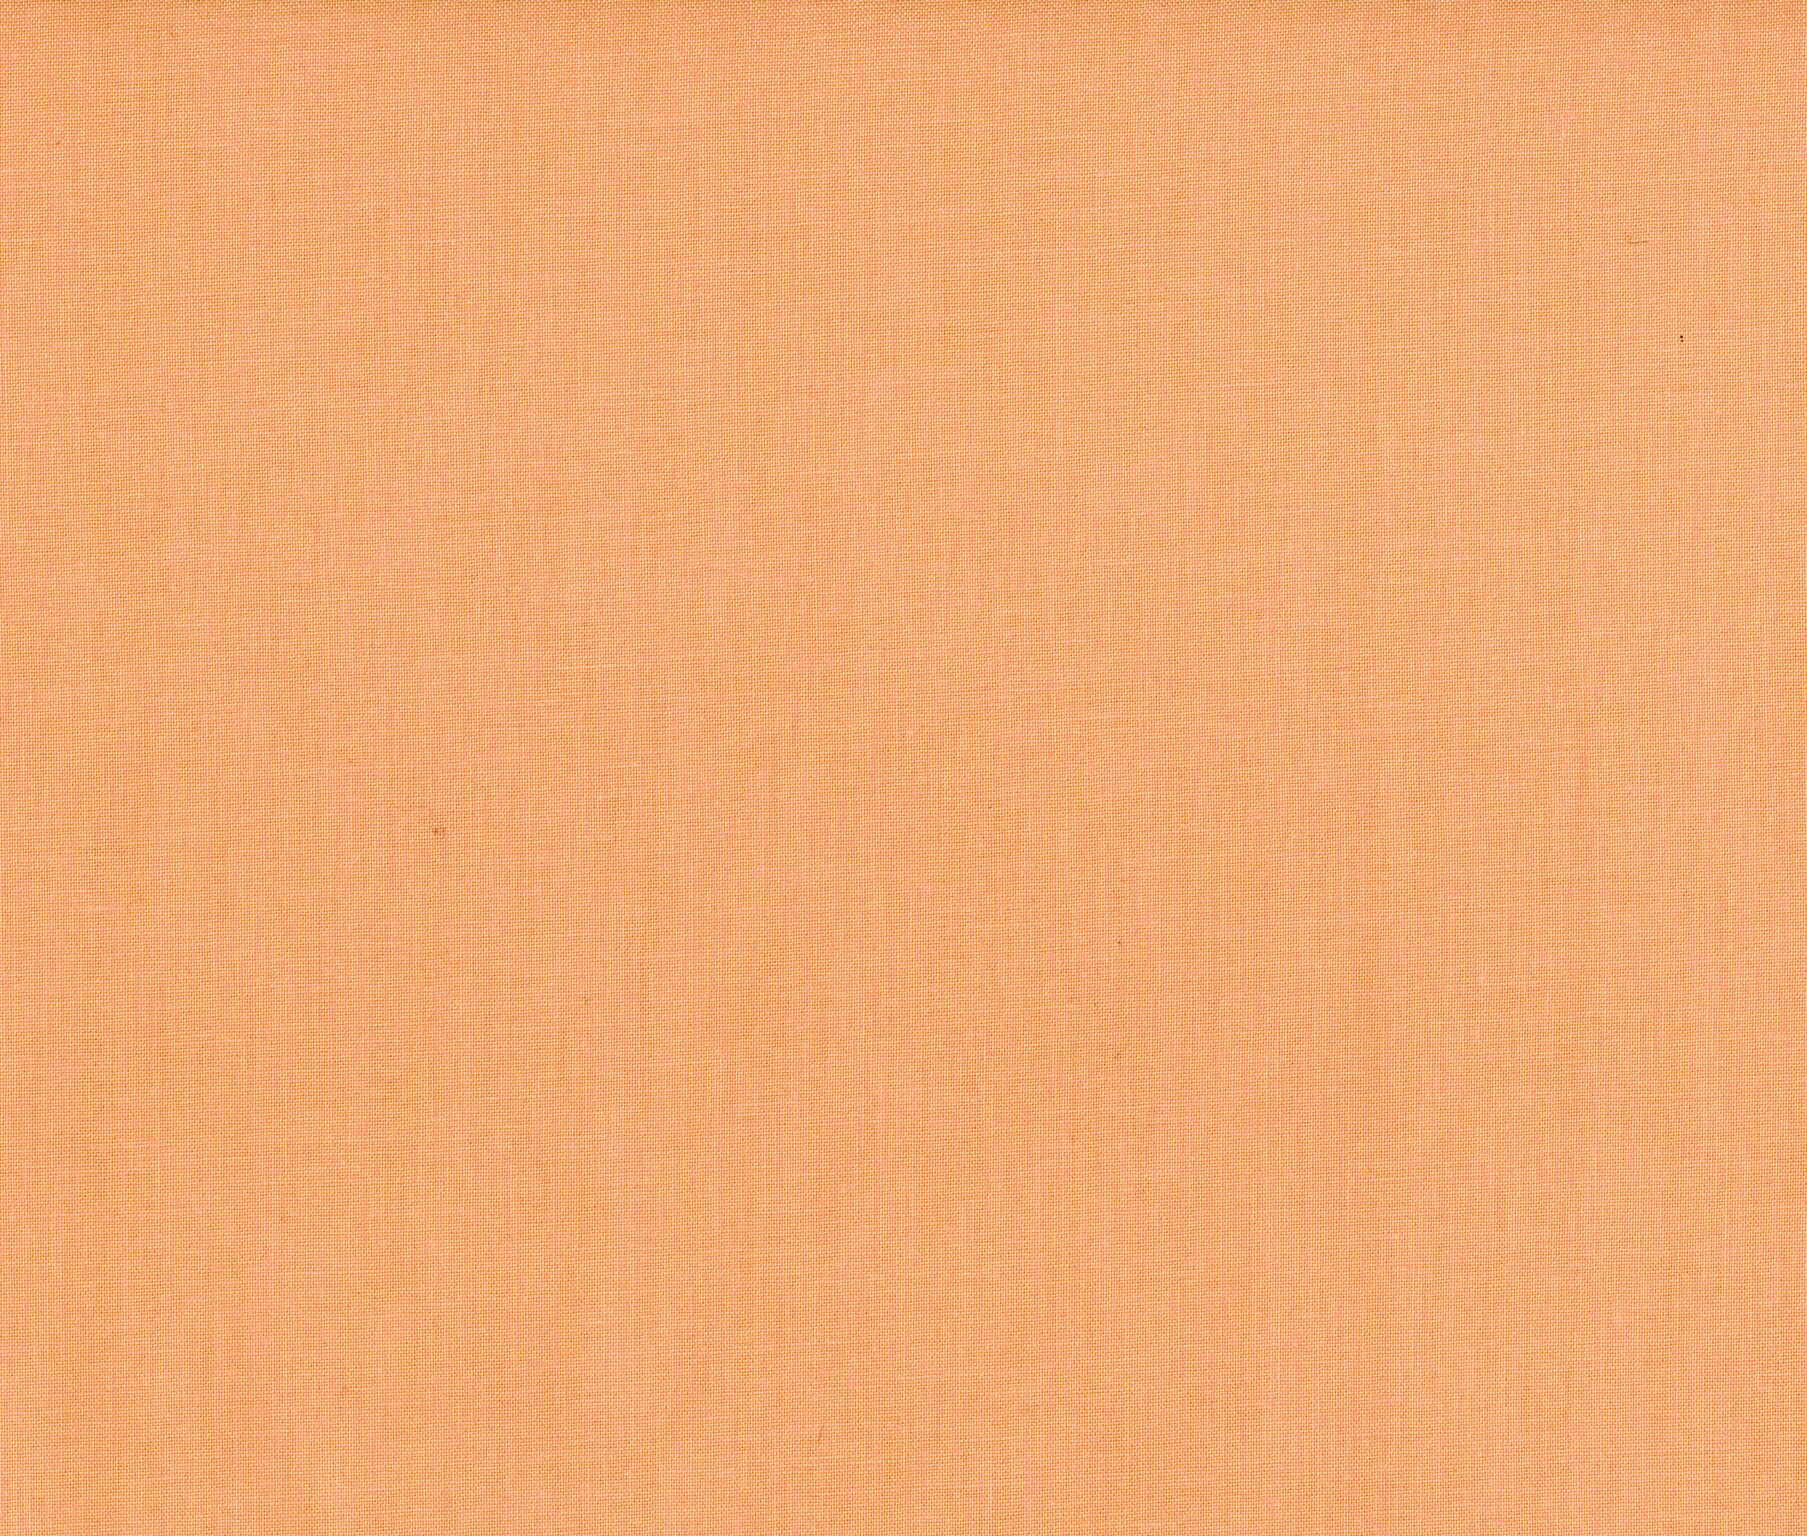 Cotton Supreme Solids- Apricot Ice- RJR Fabrics- 387